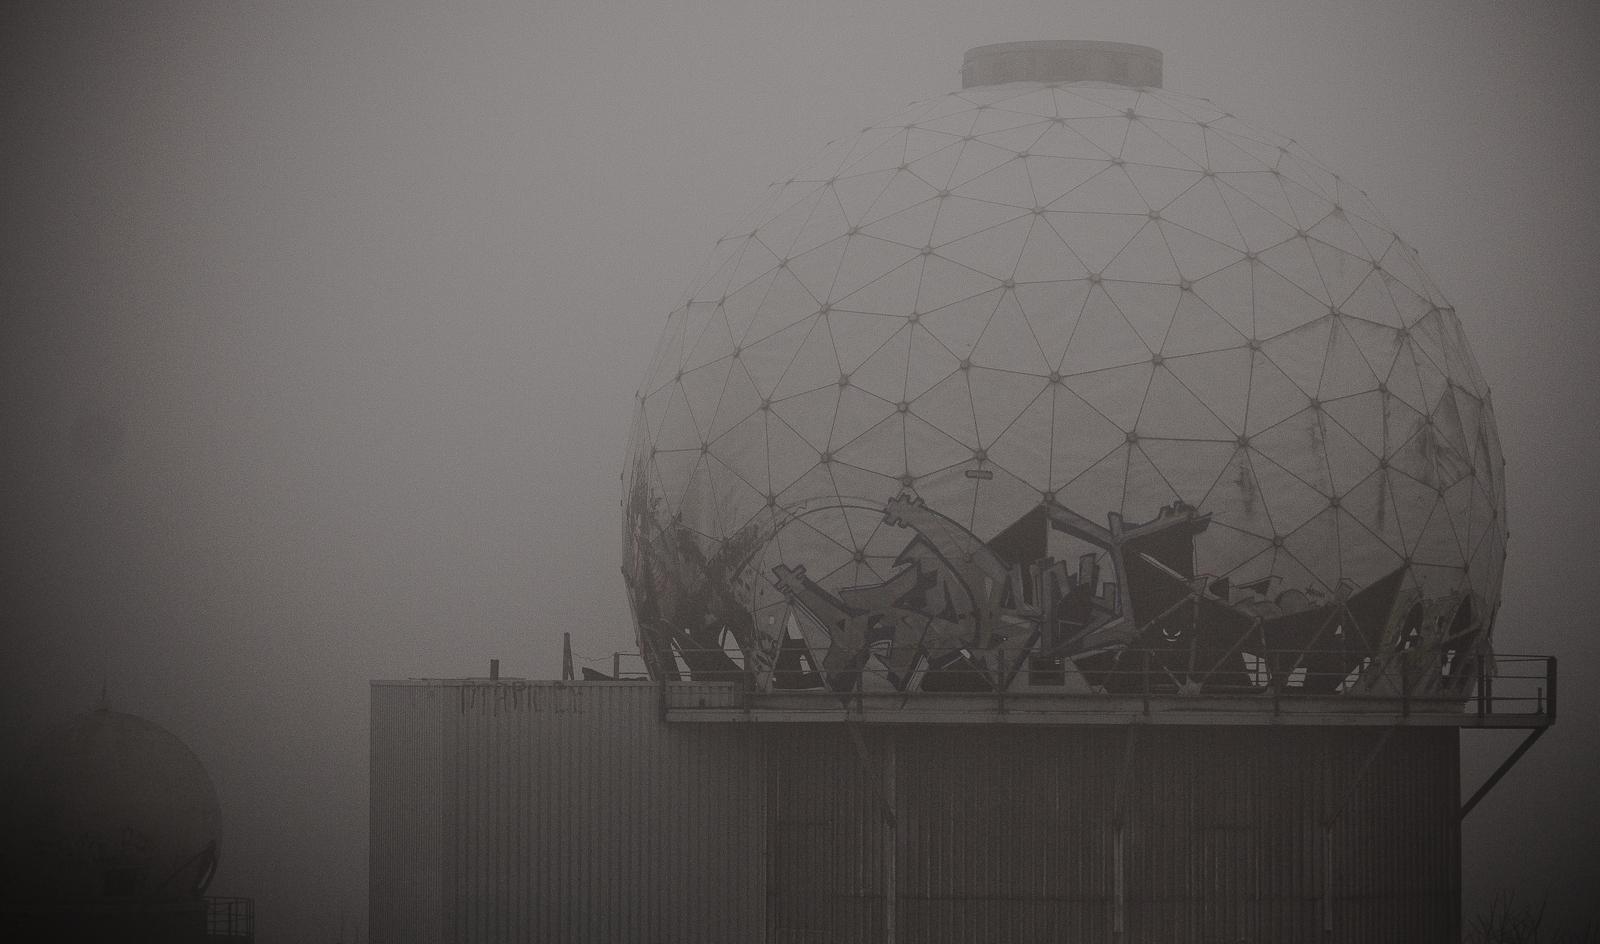 NSA Station Teufelsberg